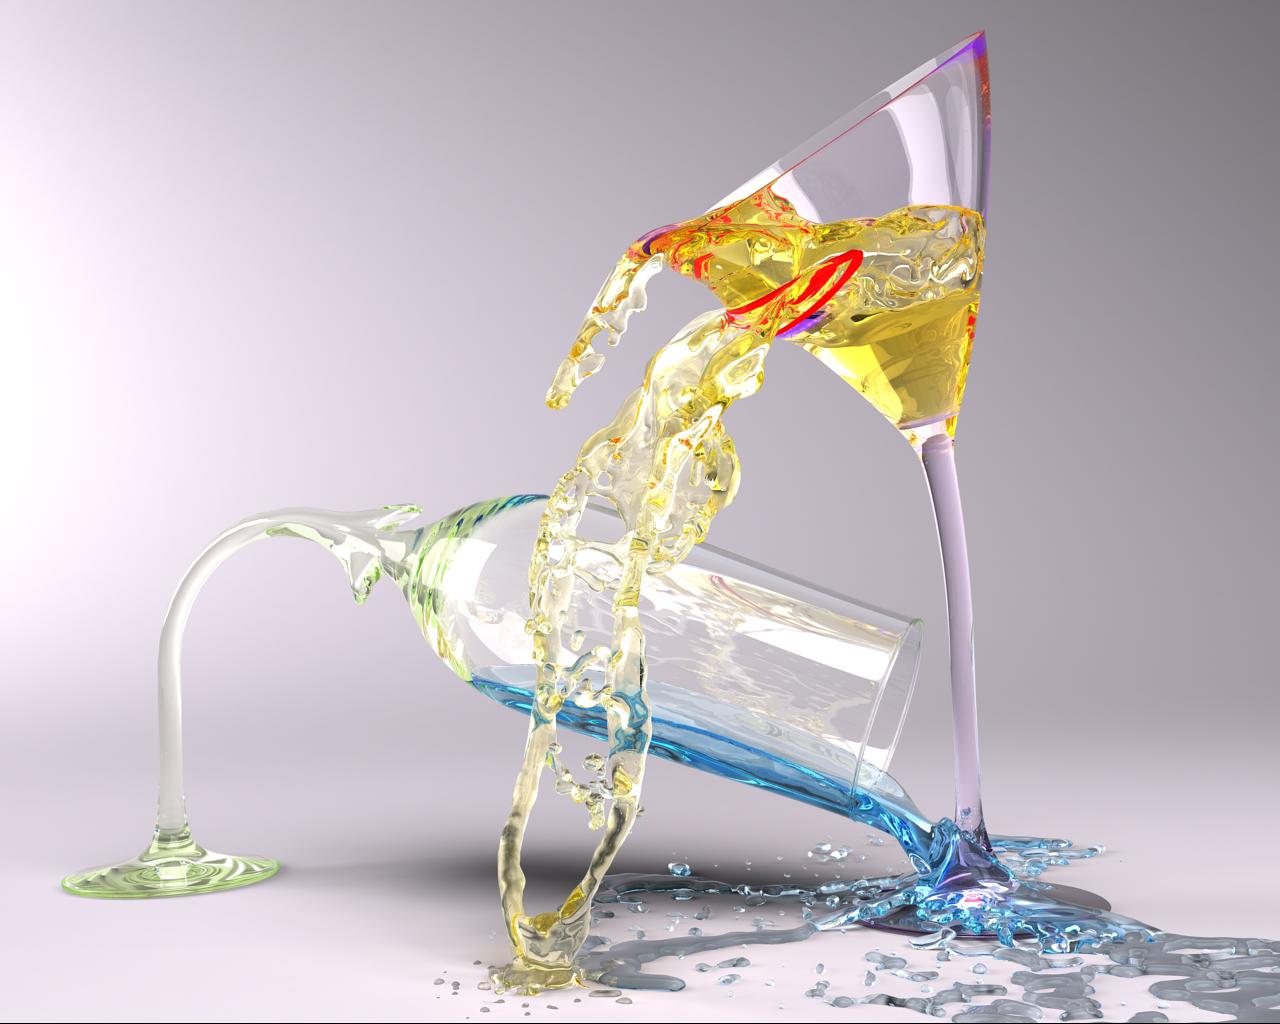 Glassical Emotions: Drunk